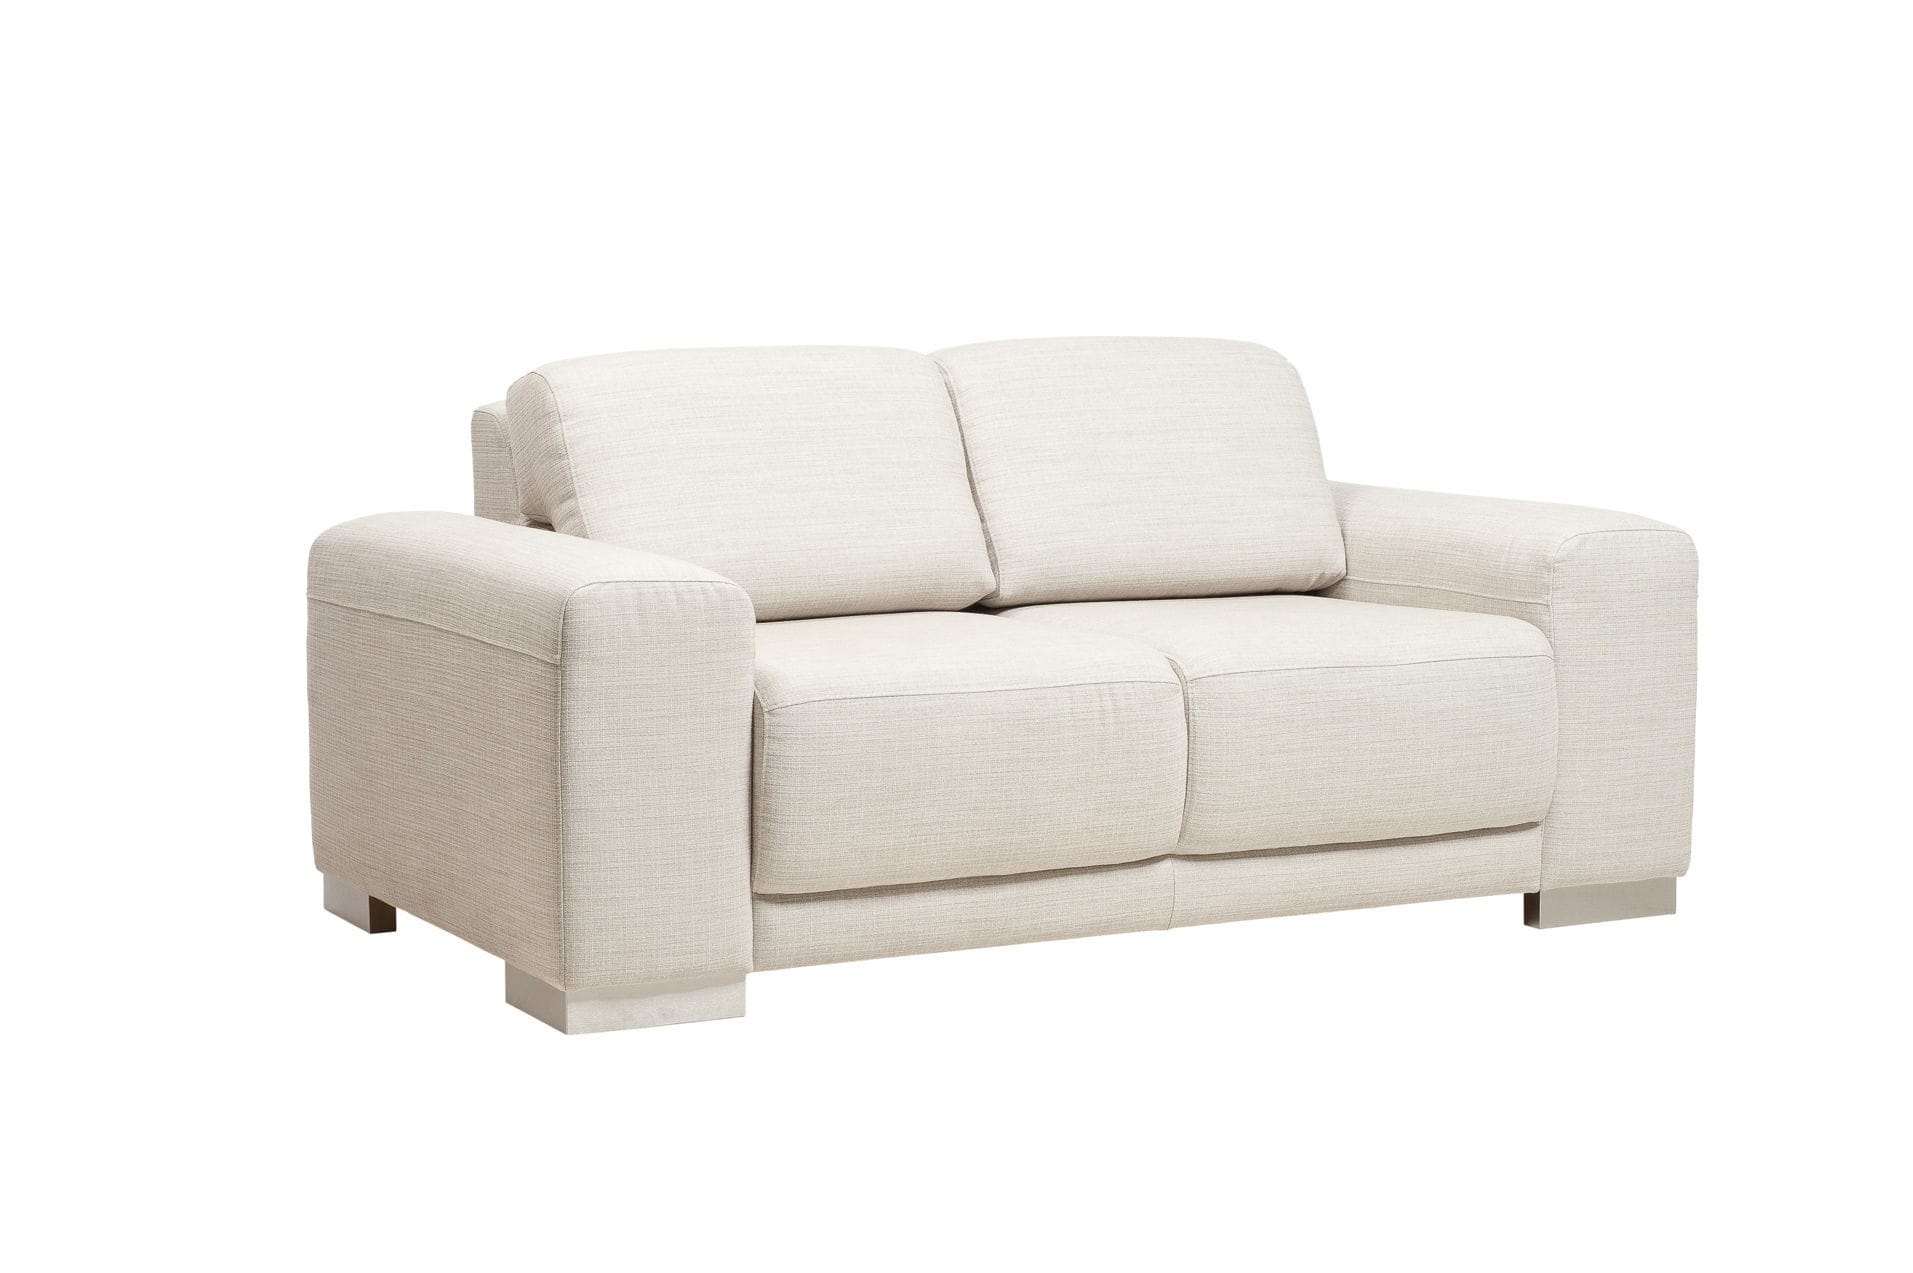 Sofa bed / corner / contemporary / leather - COPENHAGEN ...